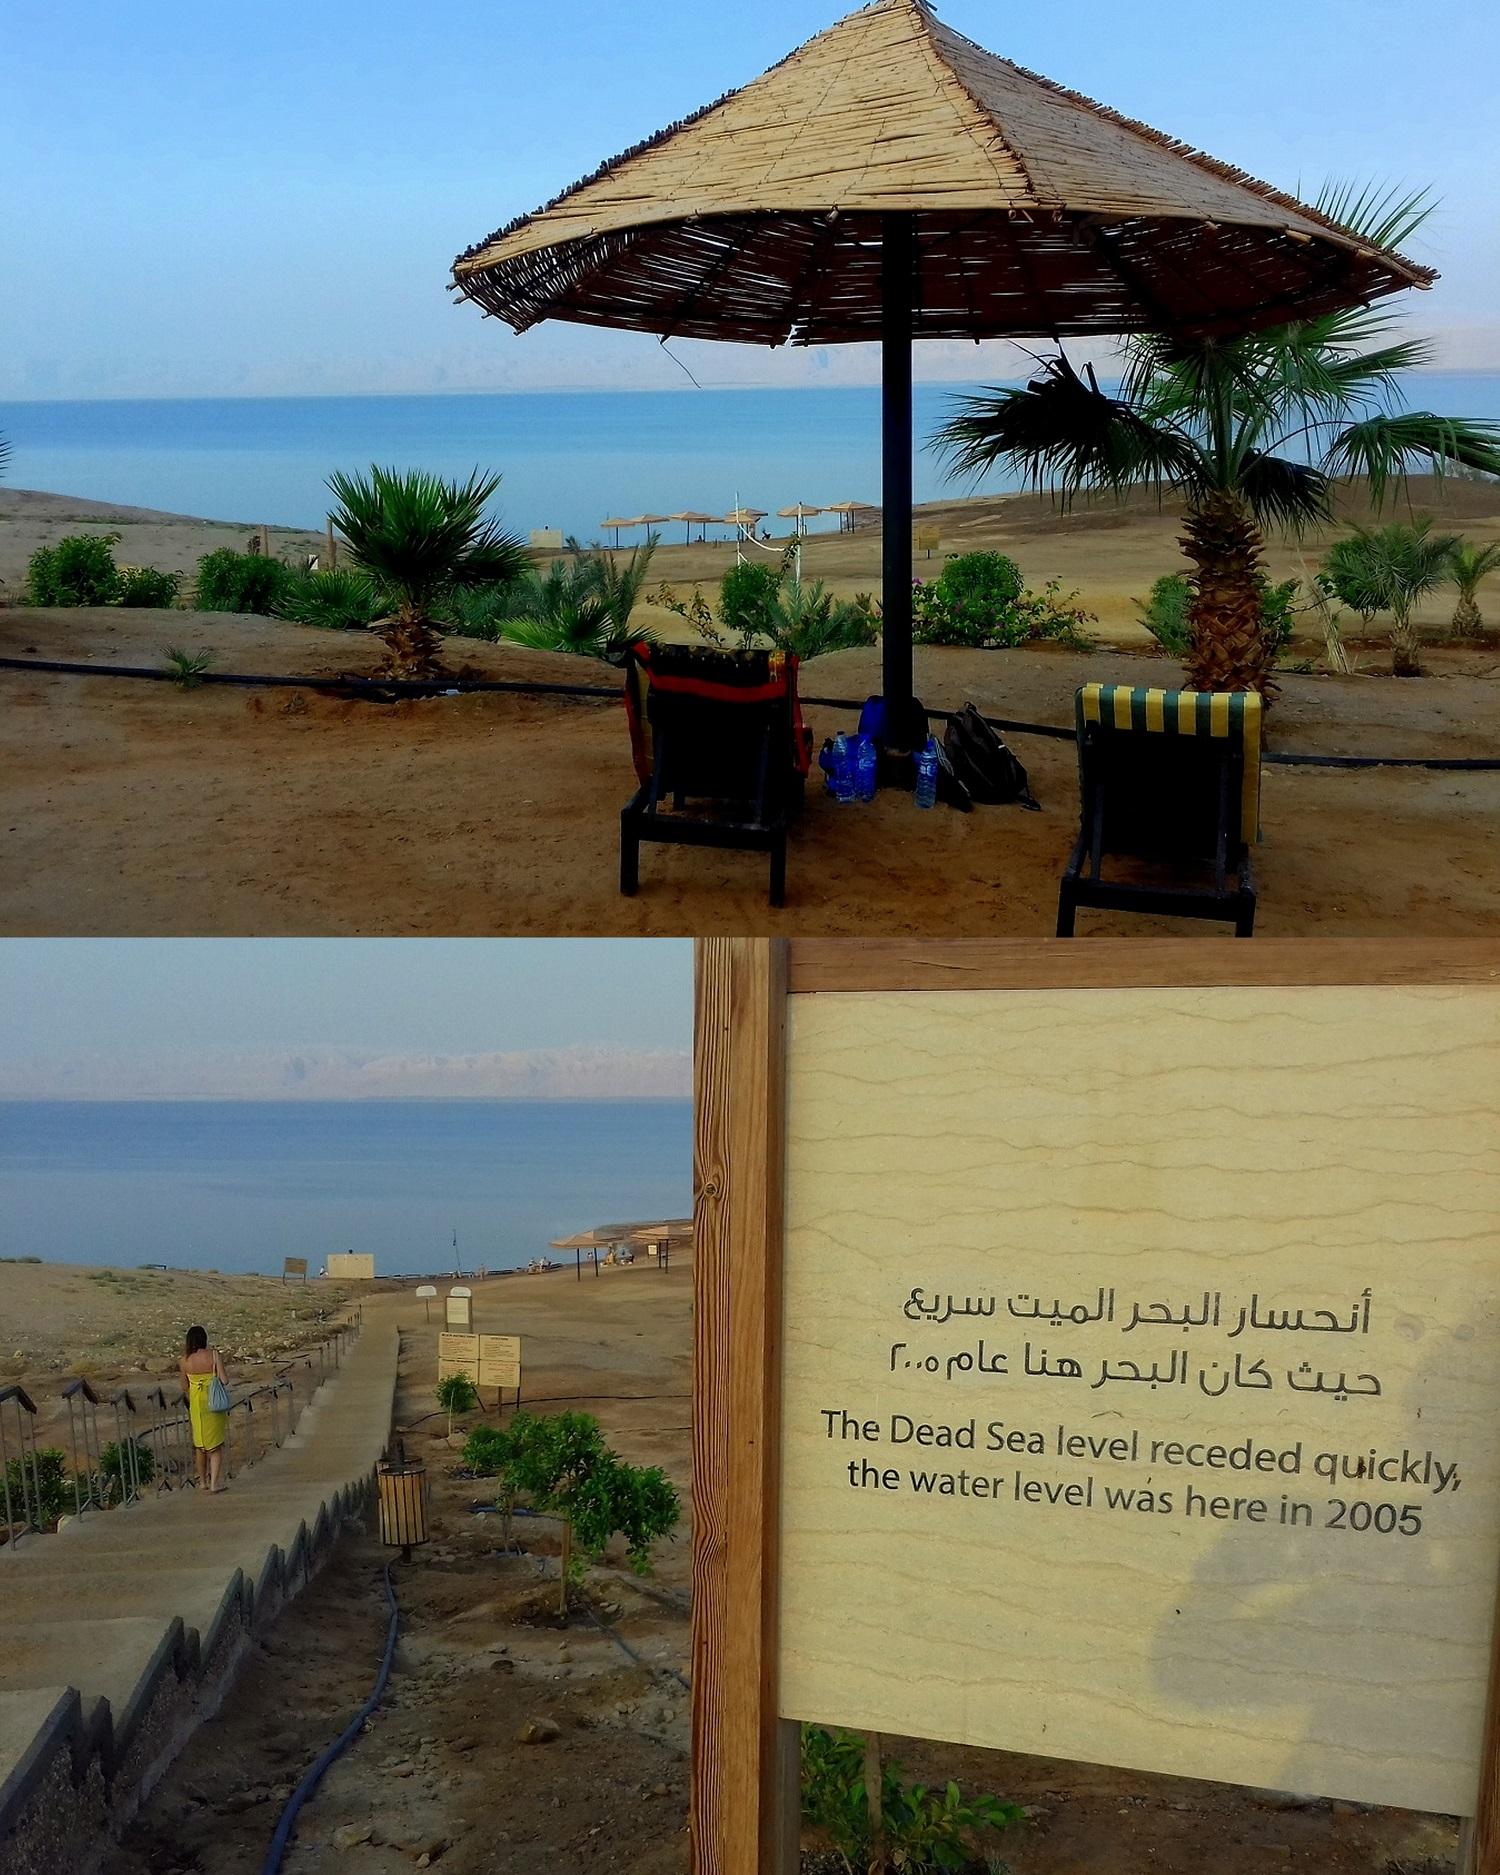 Jordánsko - Mrtvé moře